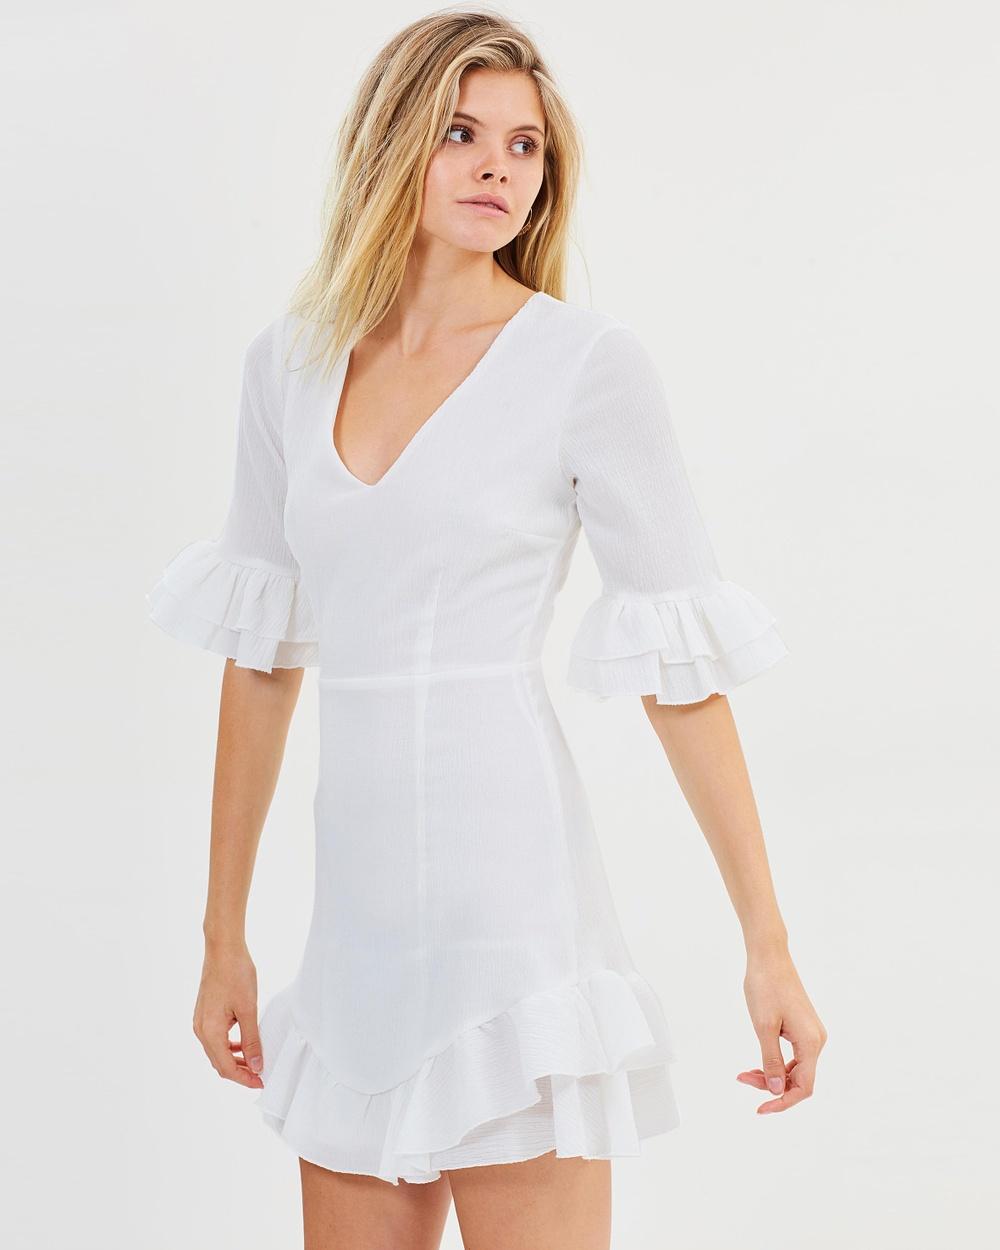 Atmos & Here ICONIC EXCLUSIVE Sara Frill Mini Dress Dresses White ICONIC EXCLUSIVE Sara Frill Mini Dress